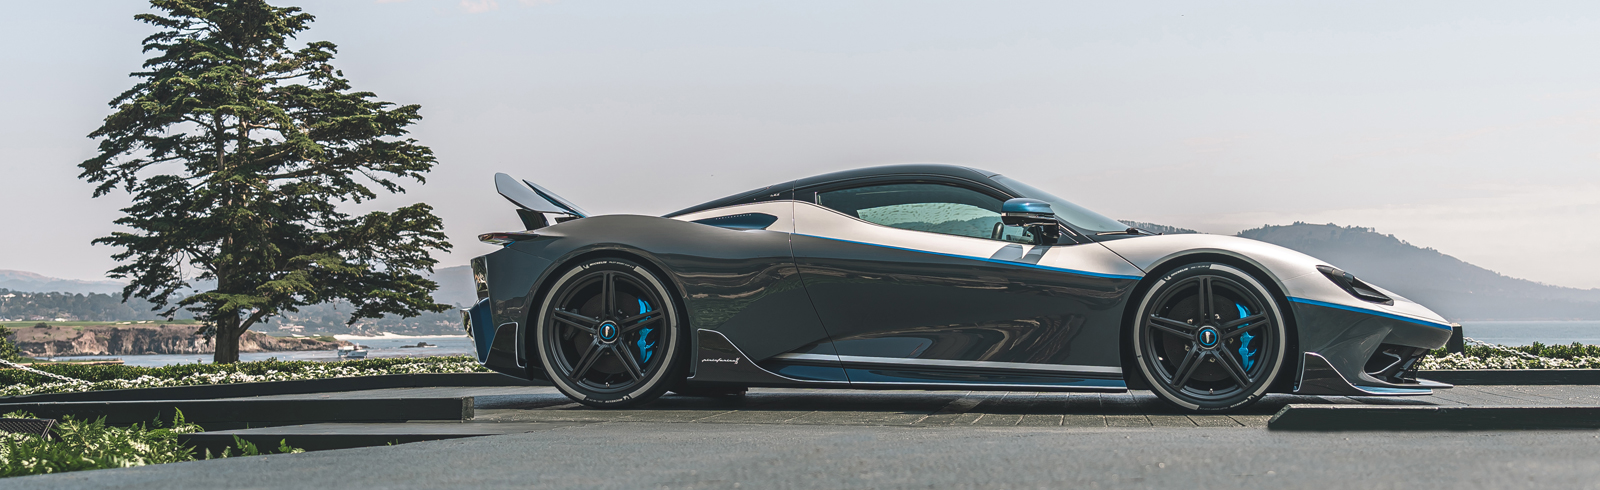 Pininfarina Battista hyper GT made its world debut at Monterey Car Week